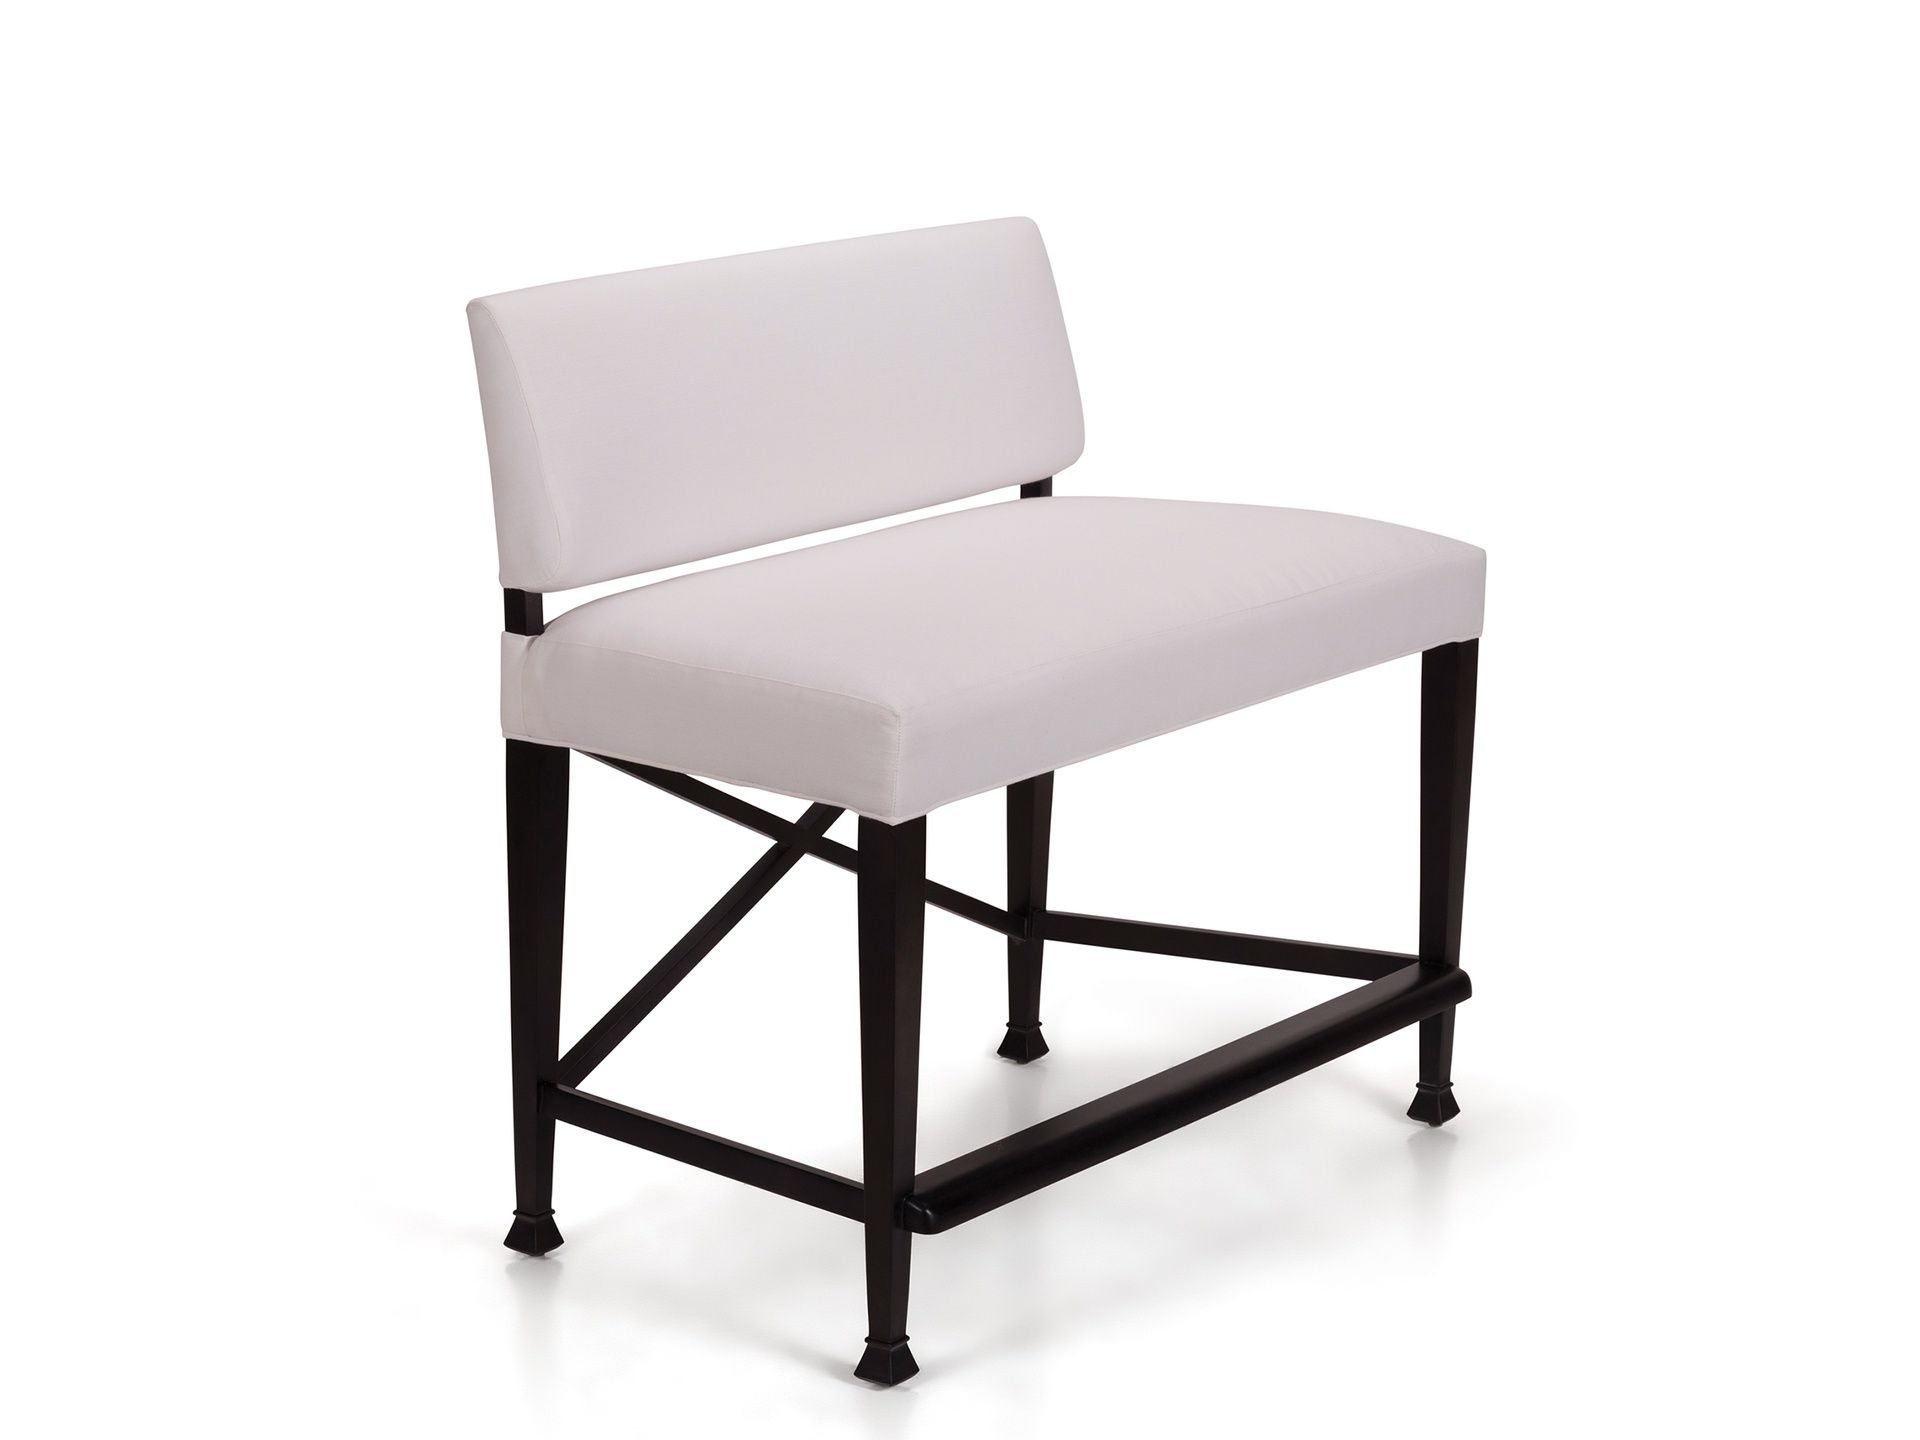 Remarkable Regalia Counter Bench Ej Victor 44H Kitchen In 2019 Machost Co Dining Chair Design Ideas Machostcouk